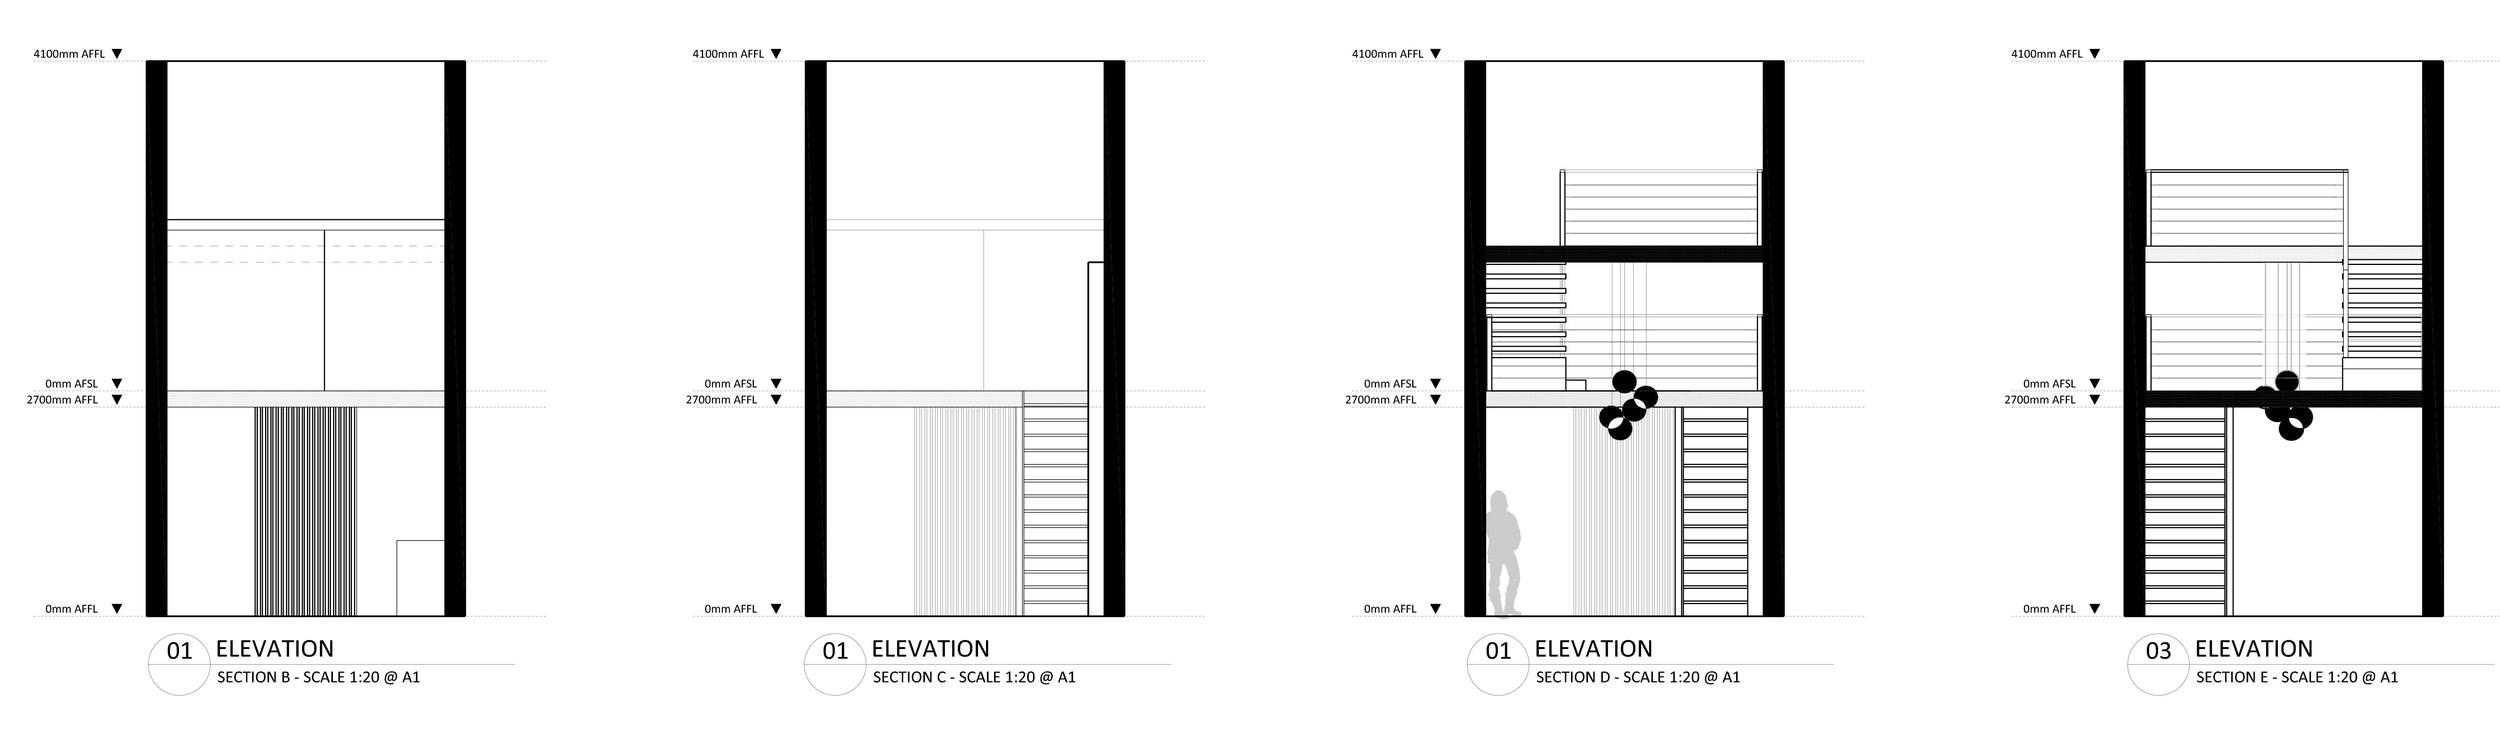 SHORT ELEVATIONS.jpeg